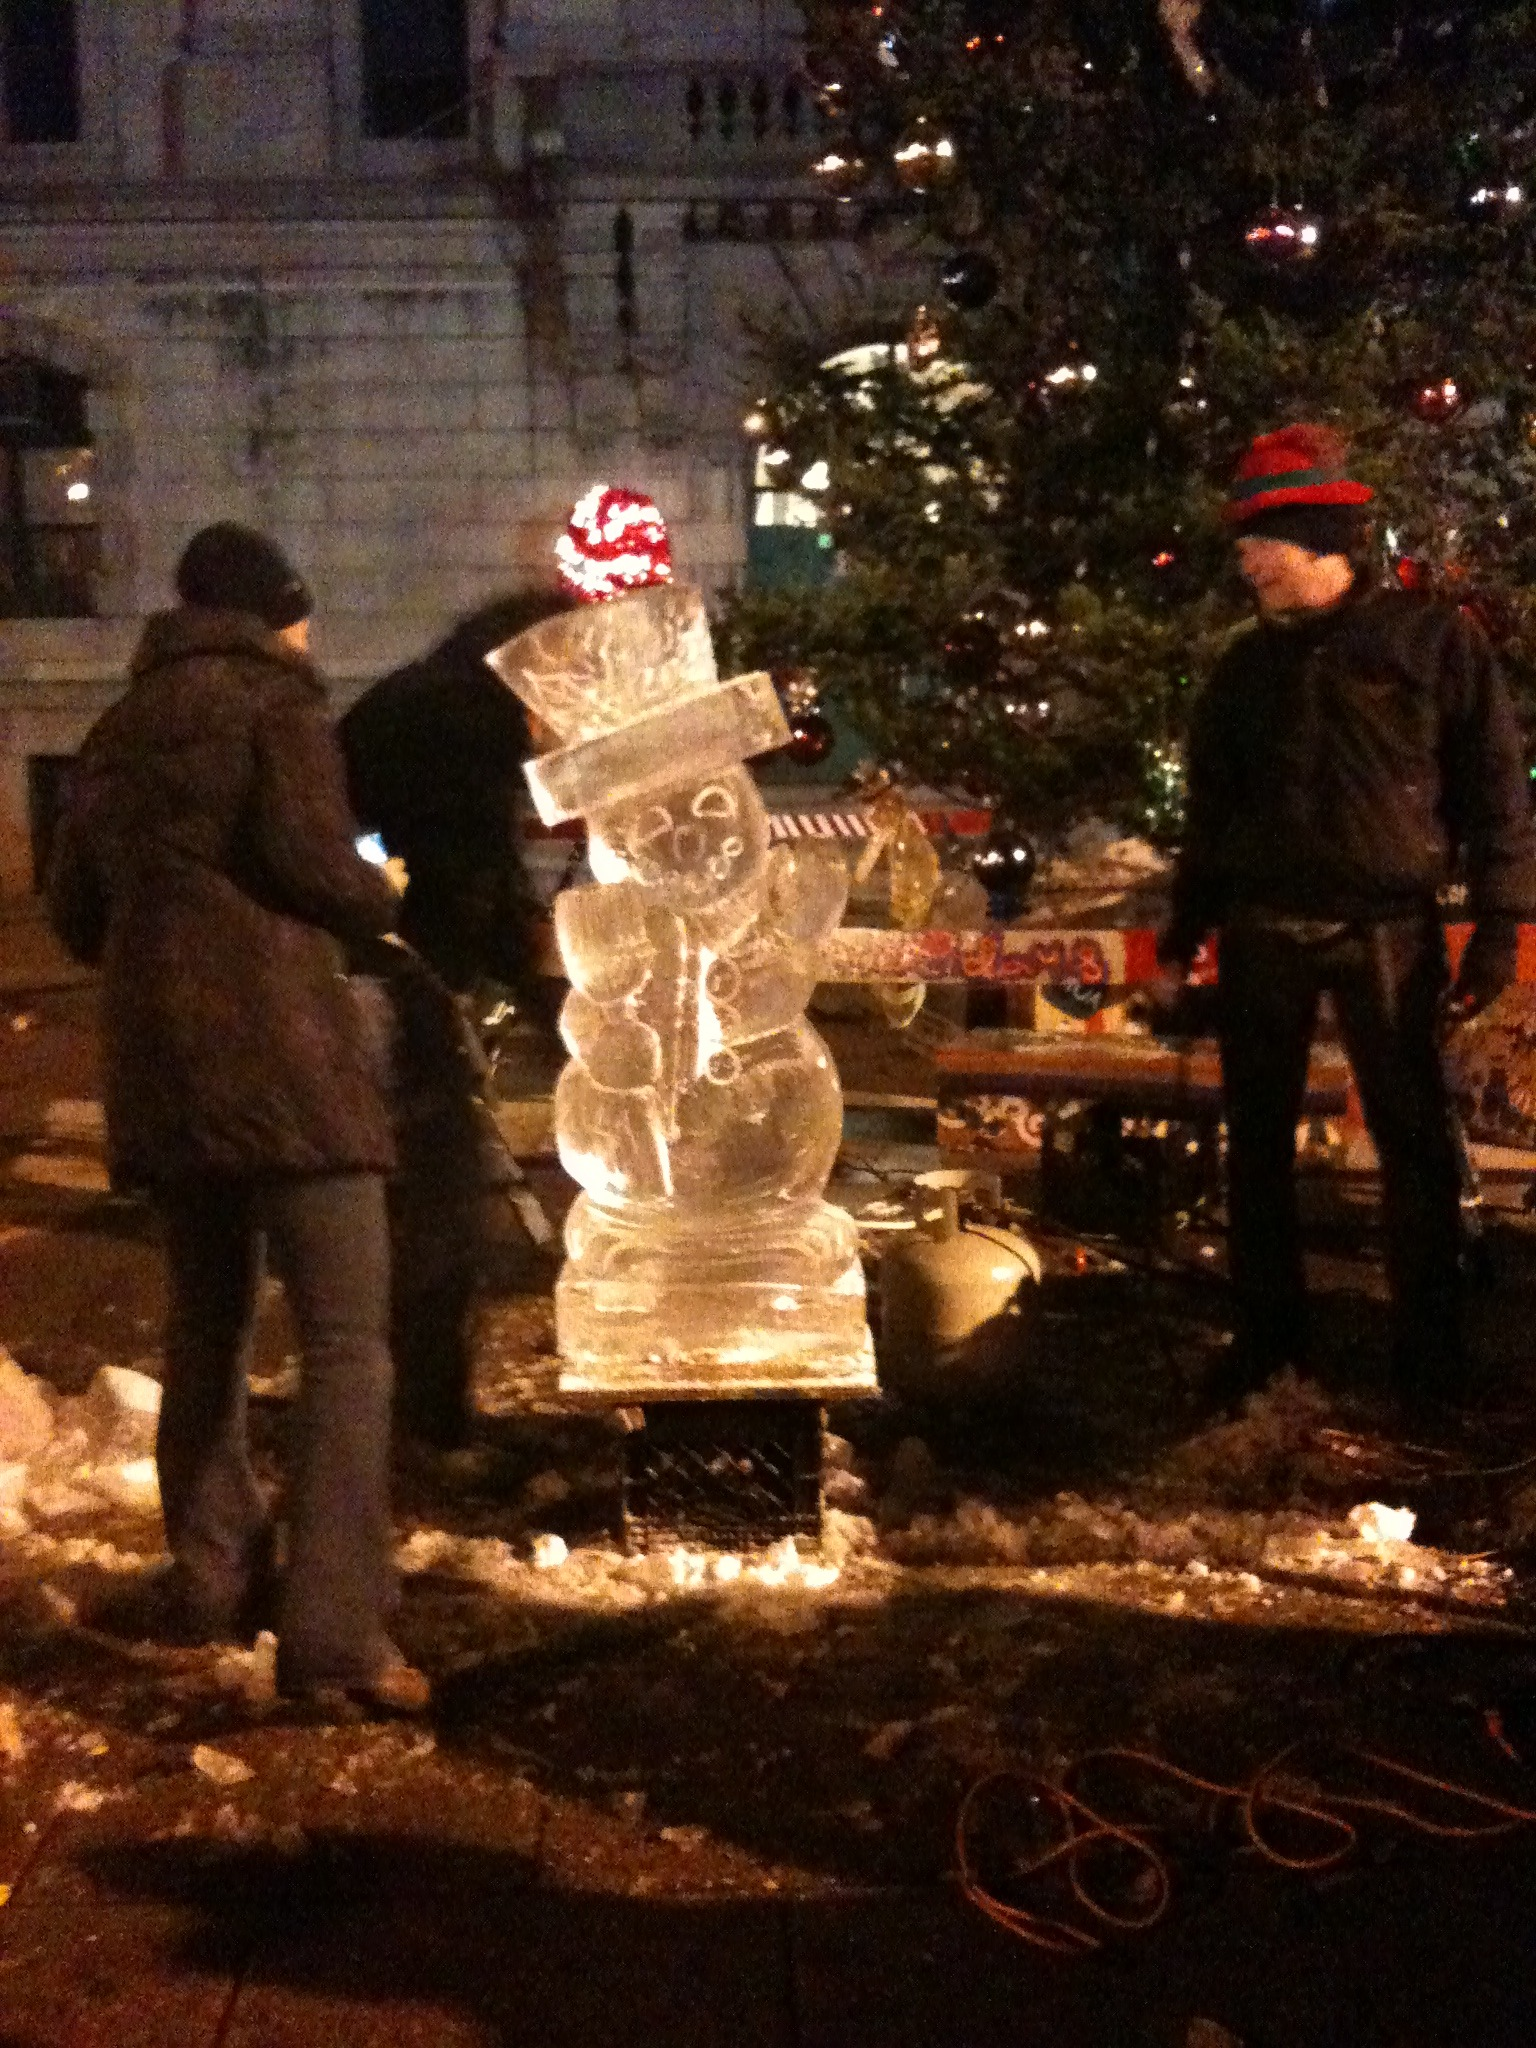 194baa1674175ad886dc_live_ice_sculpting__2_.jpg